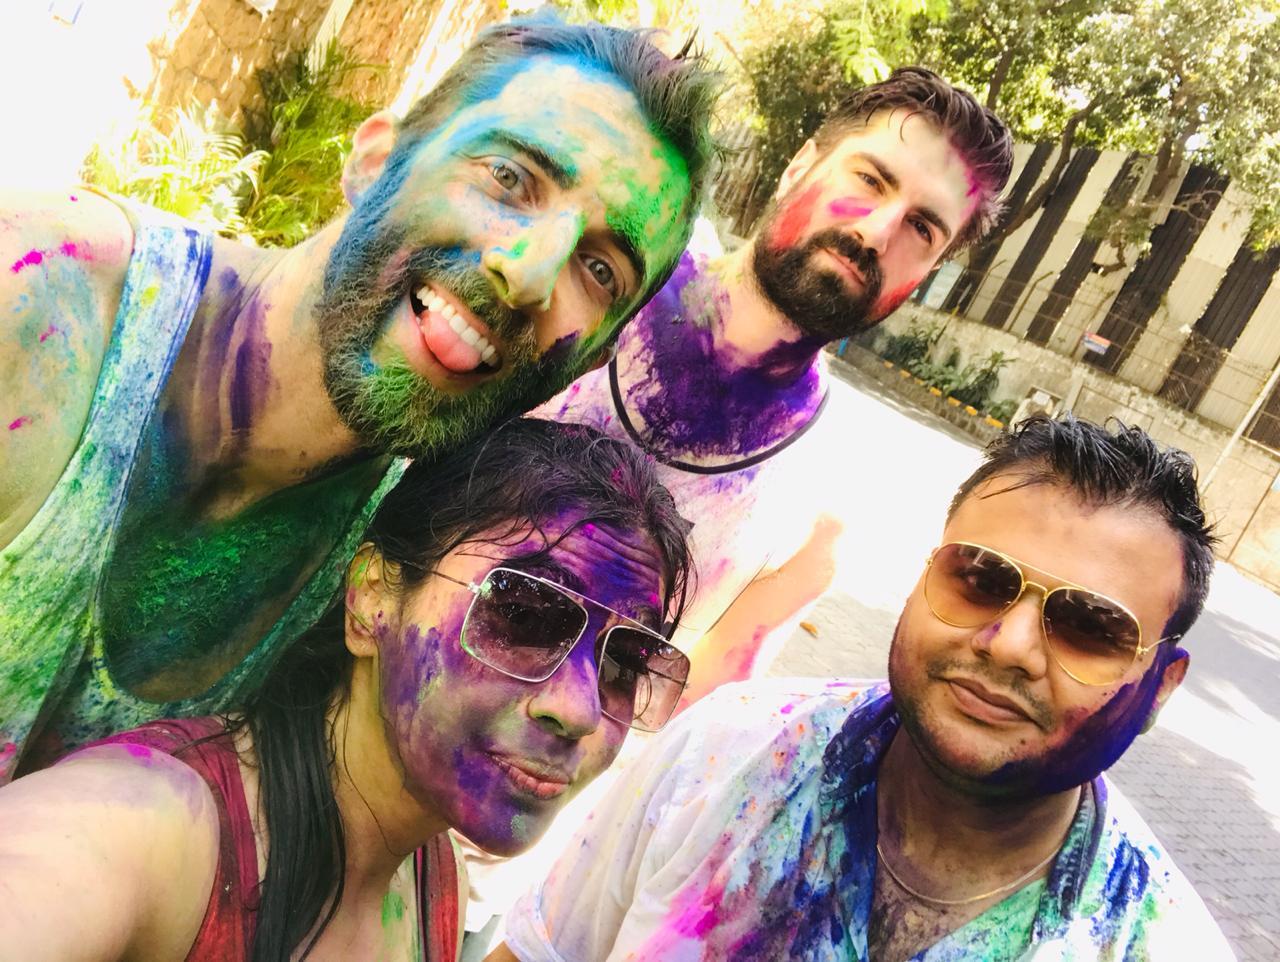 india mumbai color festival gringo